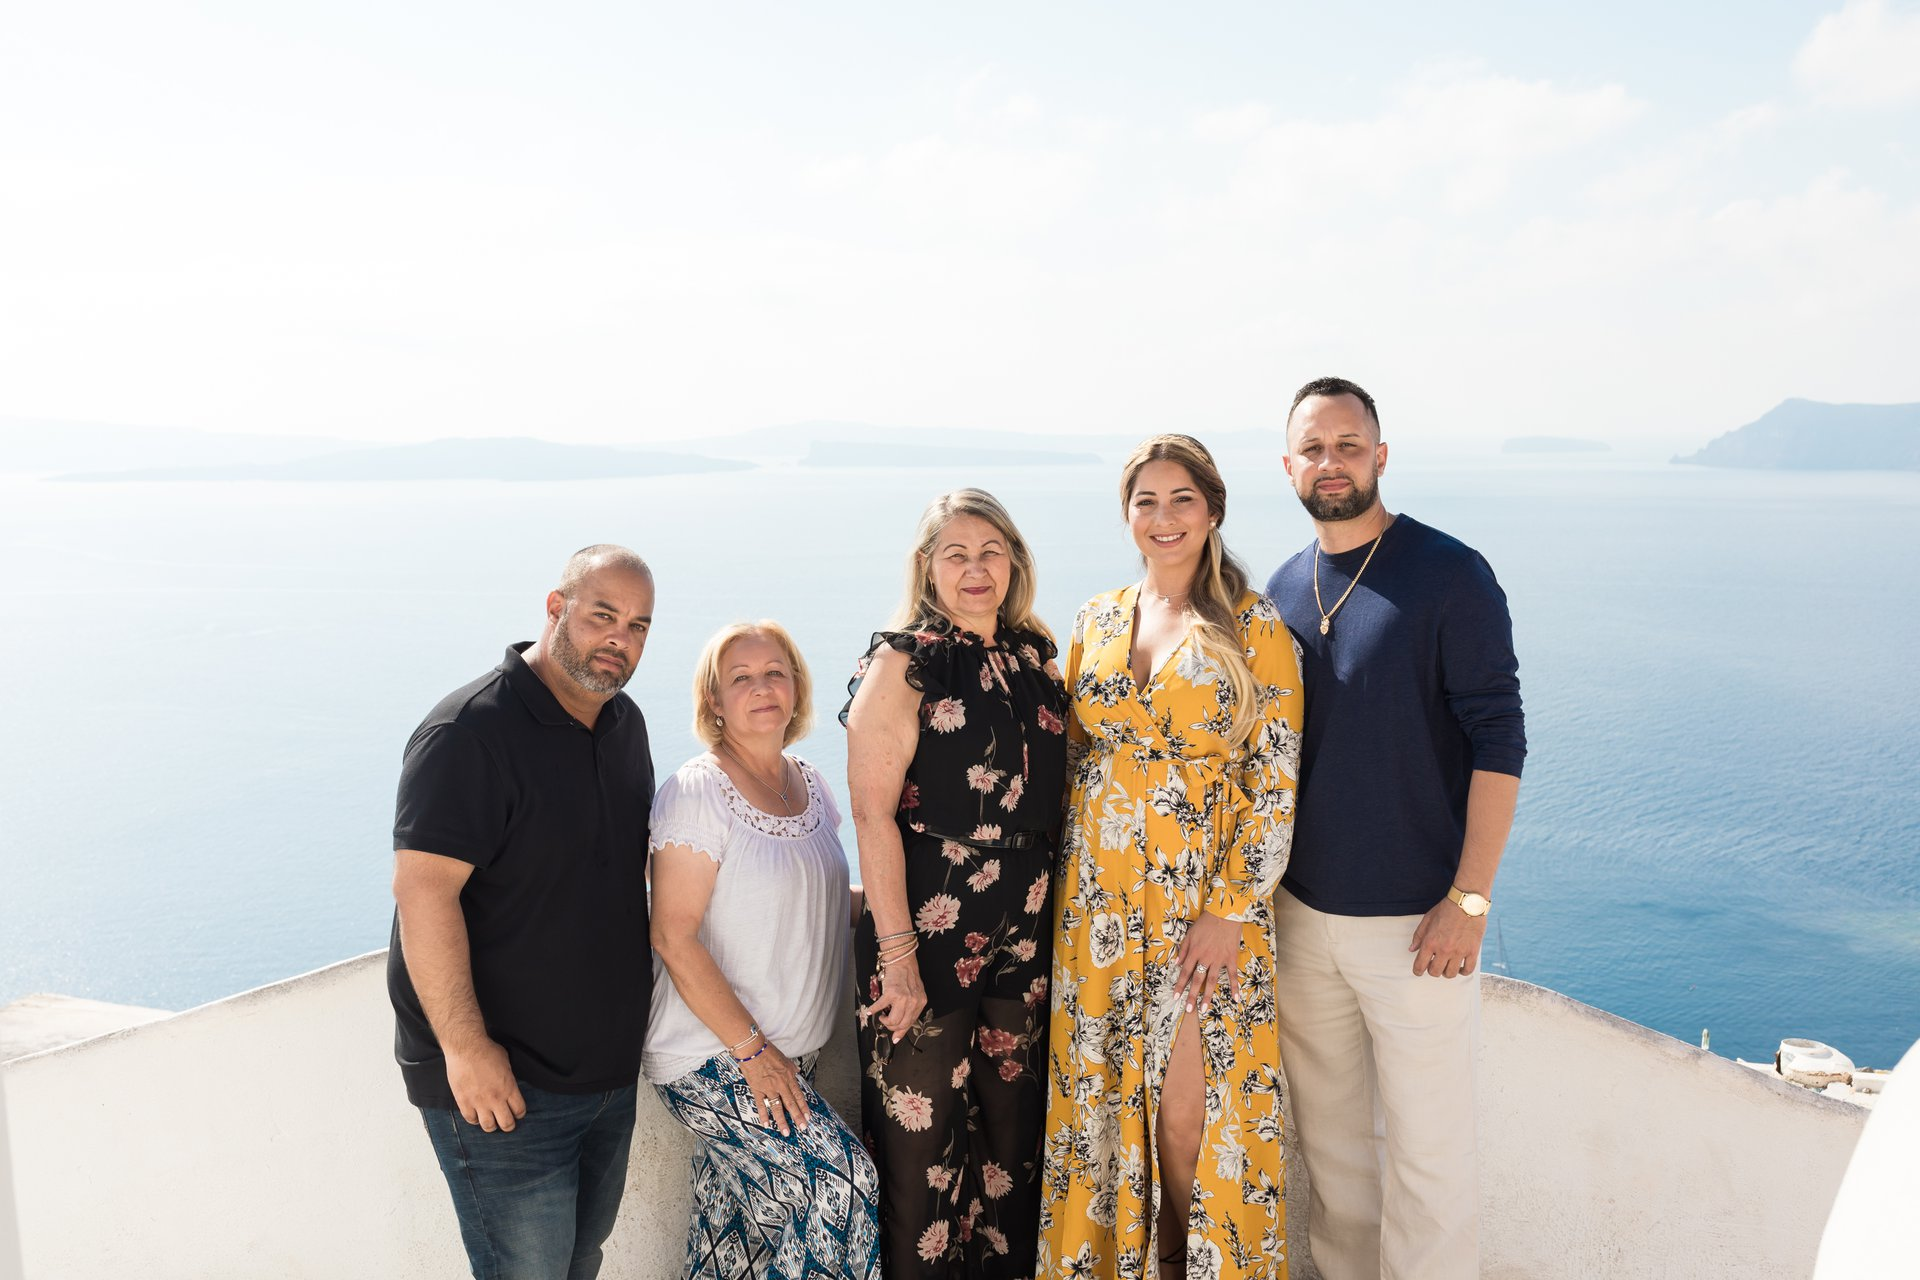 Santorini-Greece-travel-story-Flytographer-13